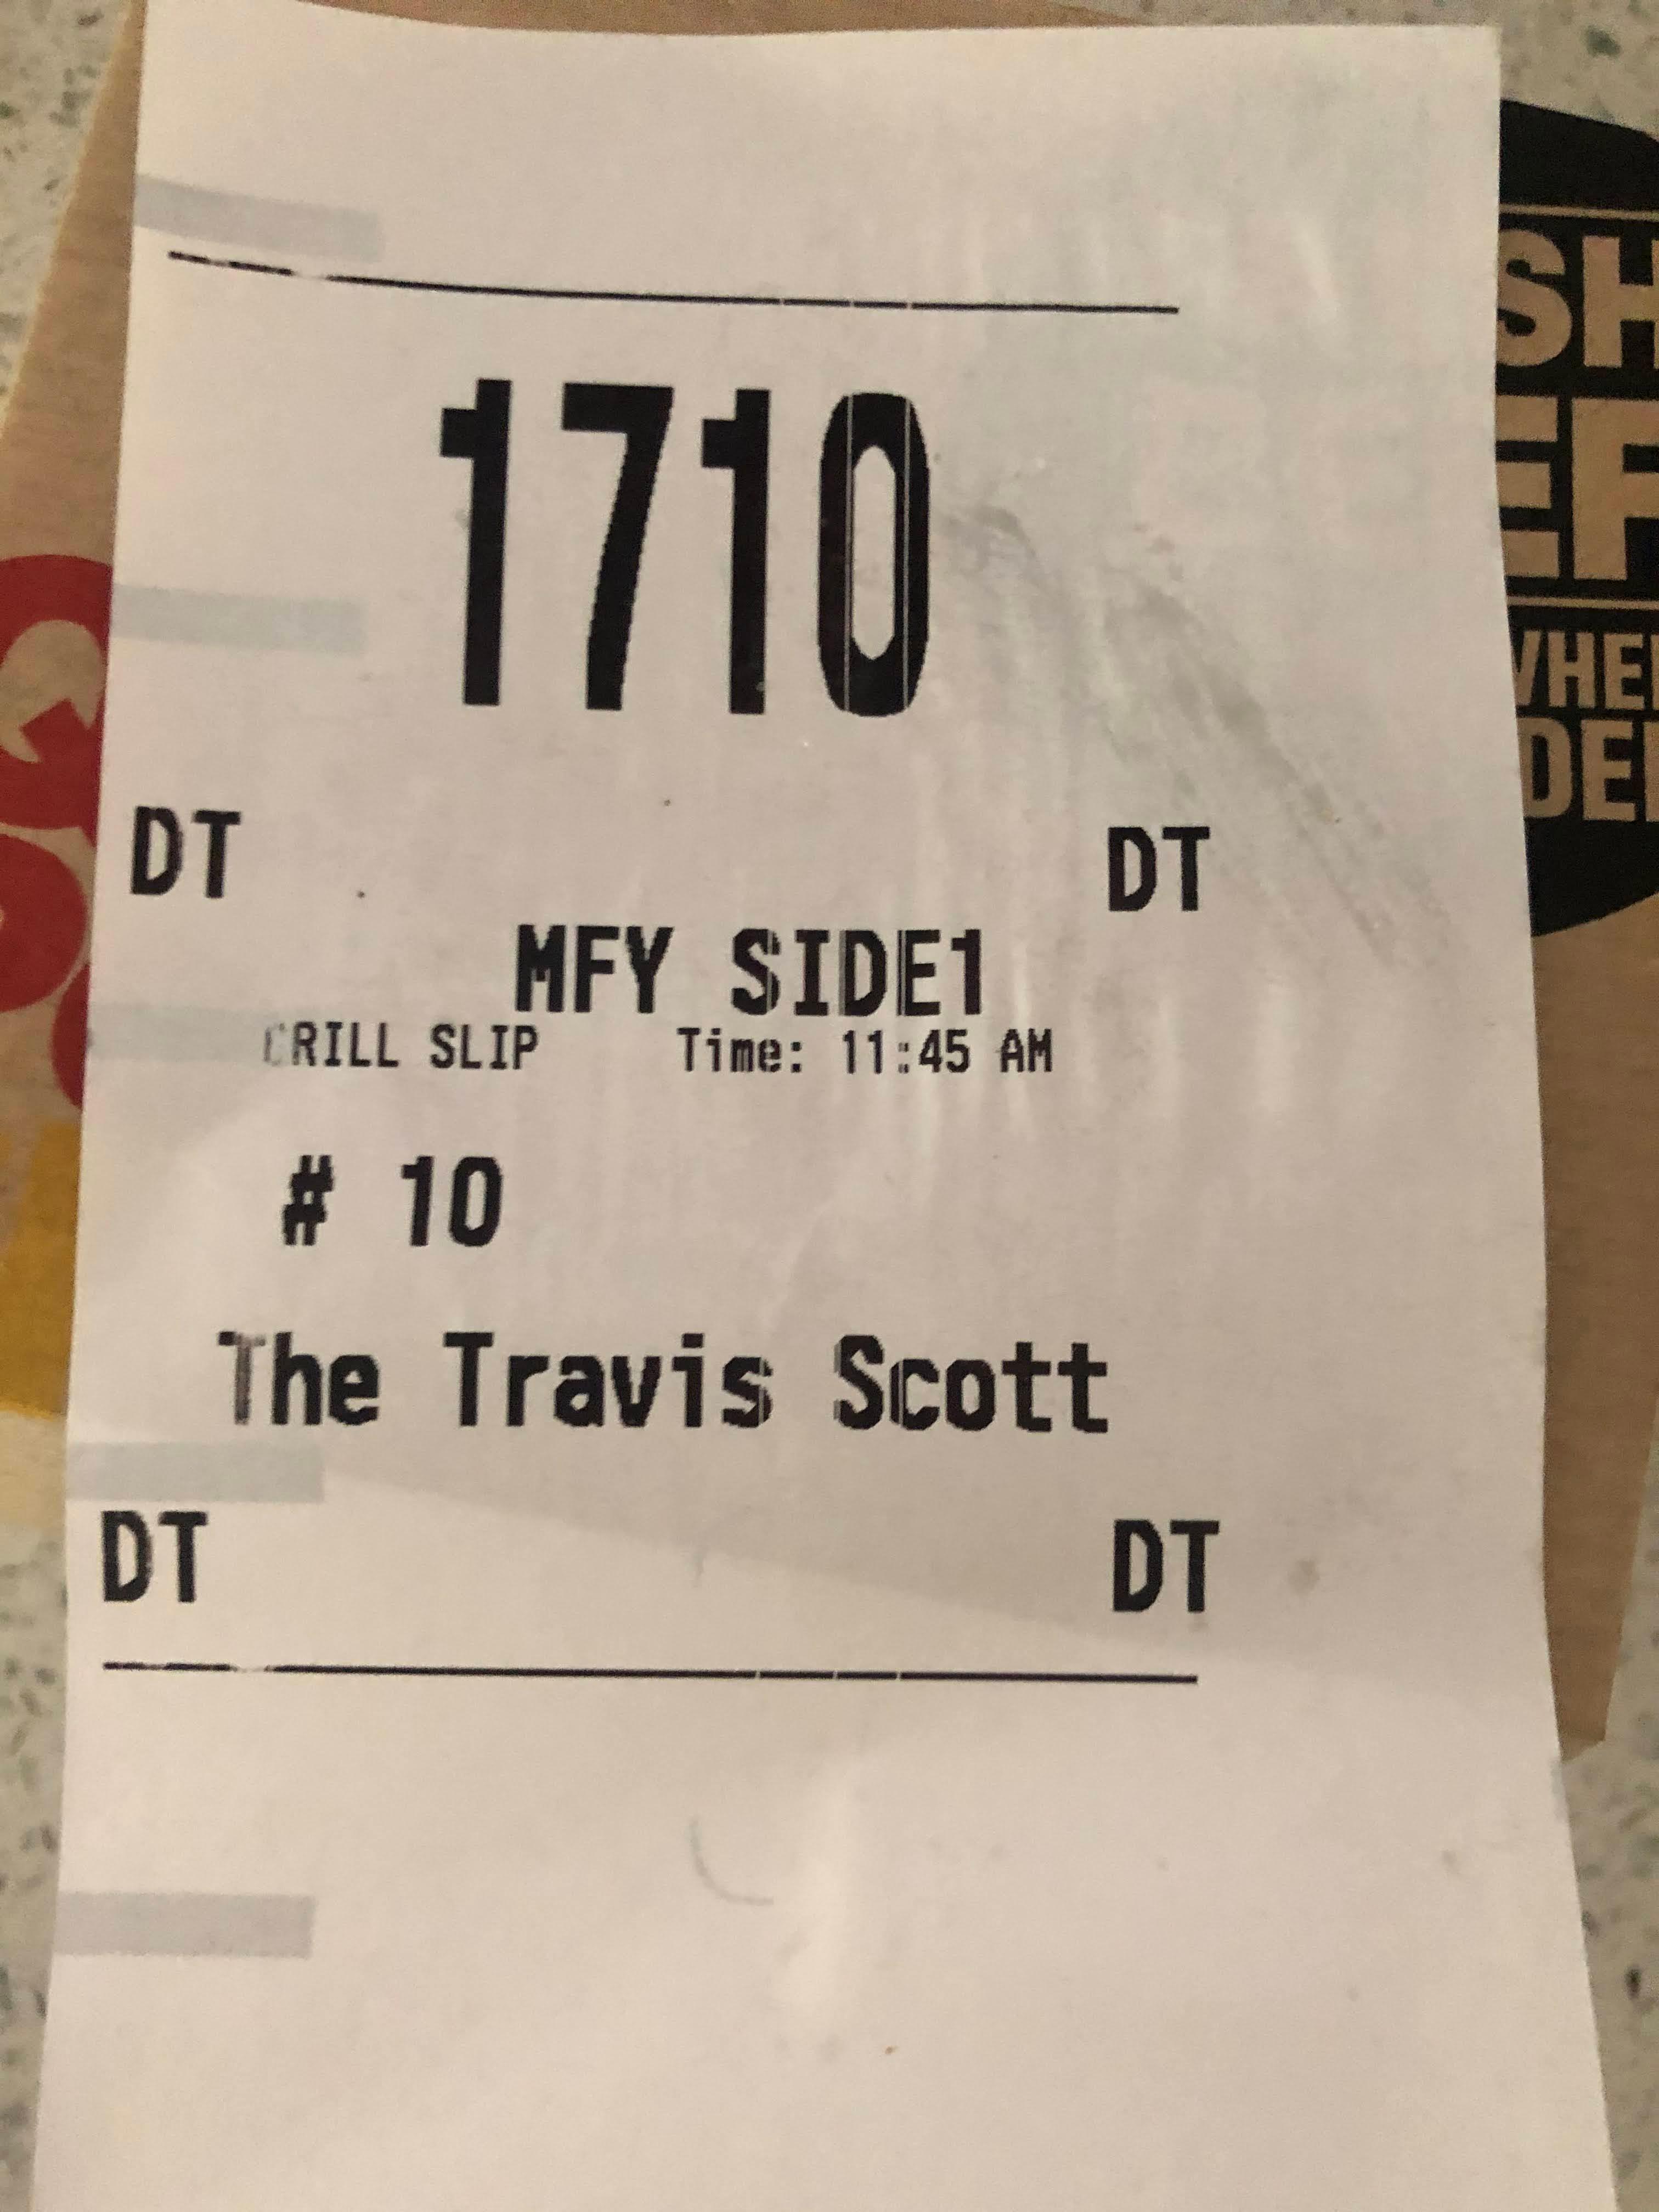 food service market research mcdonalds receipt